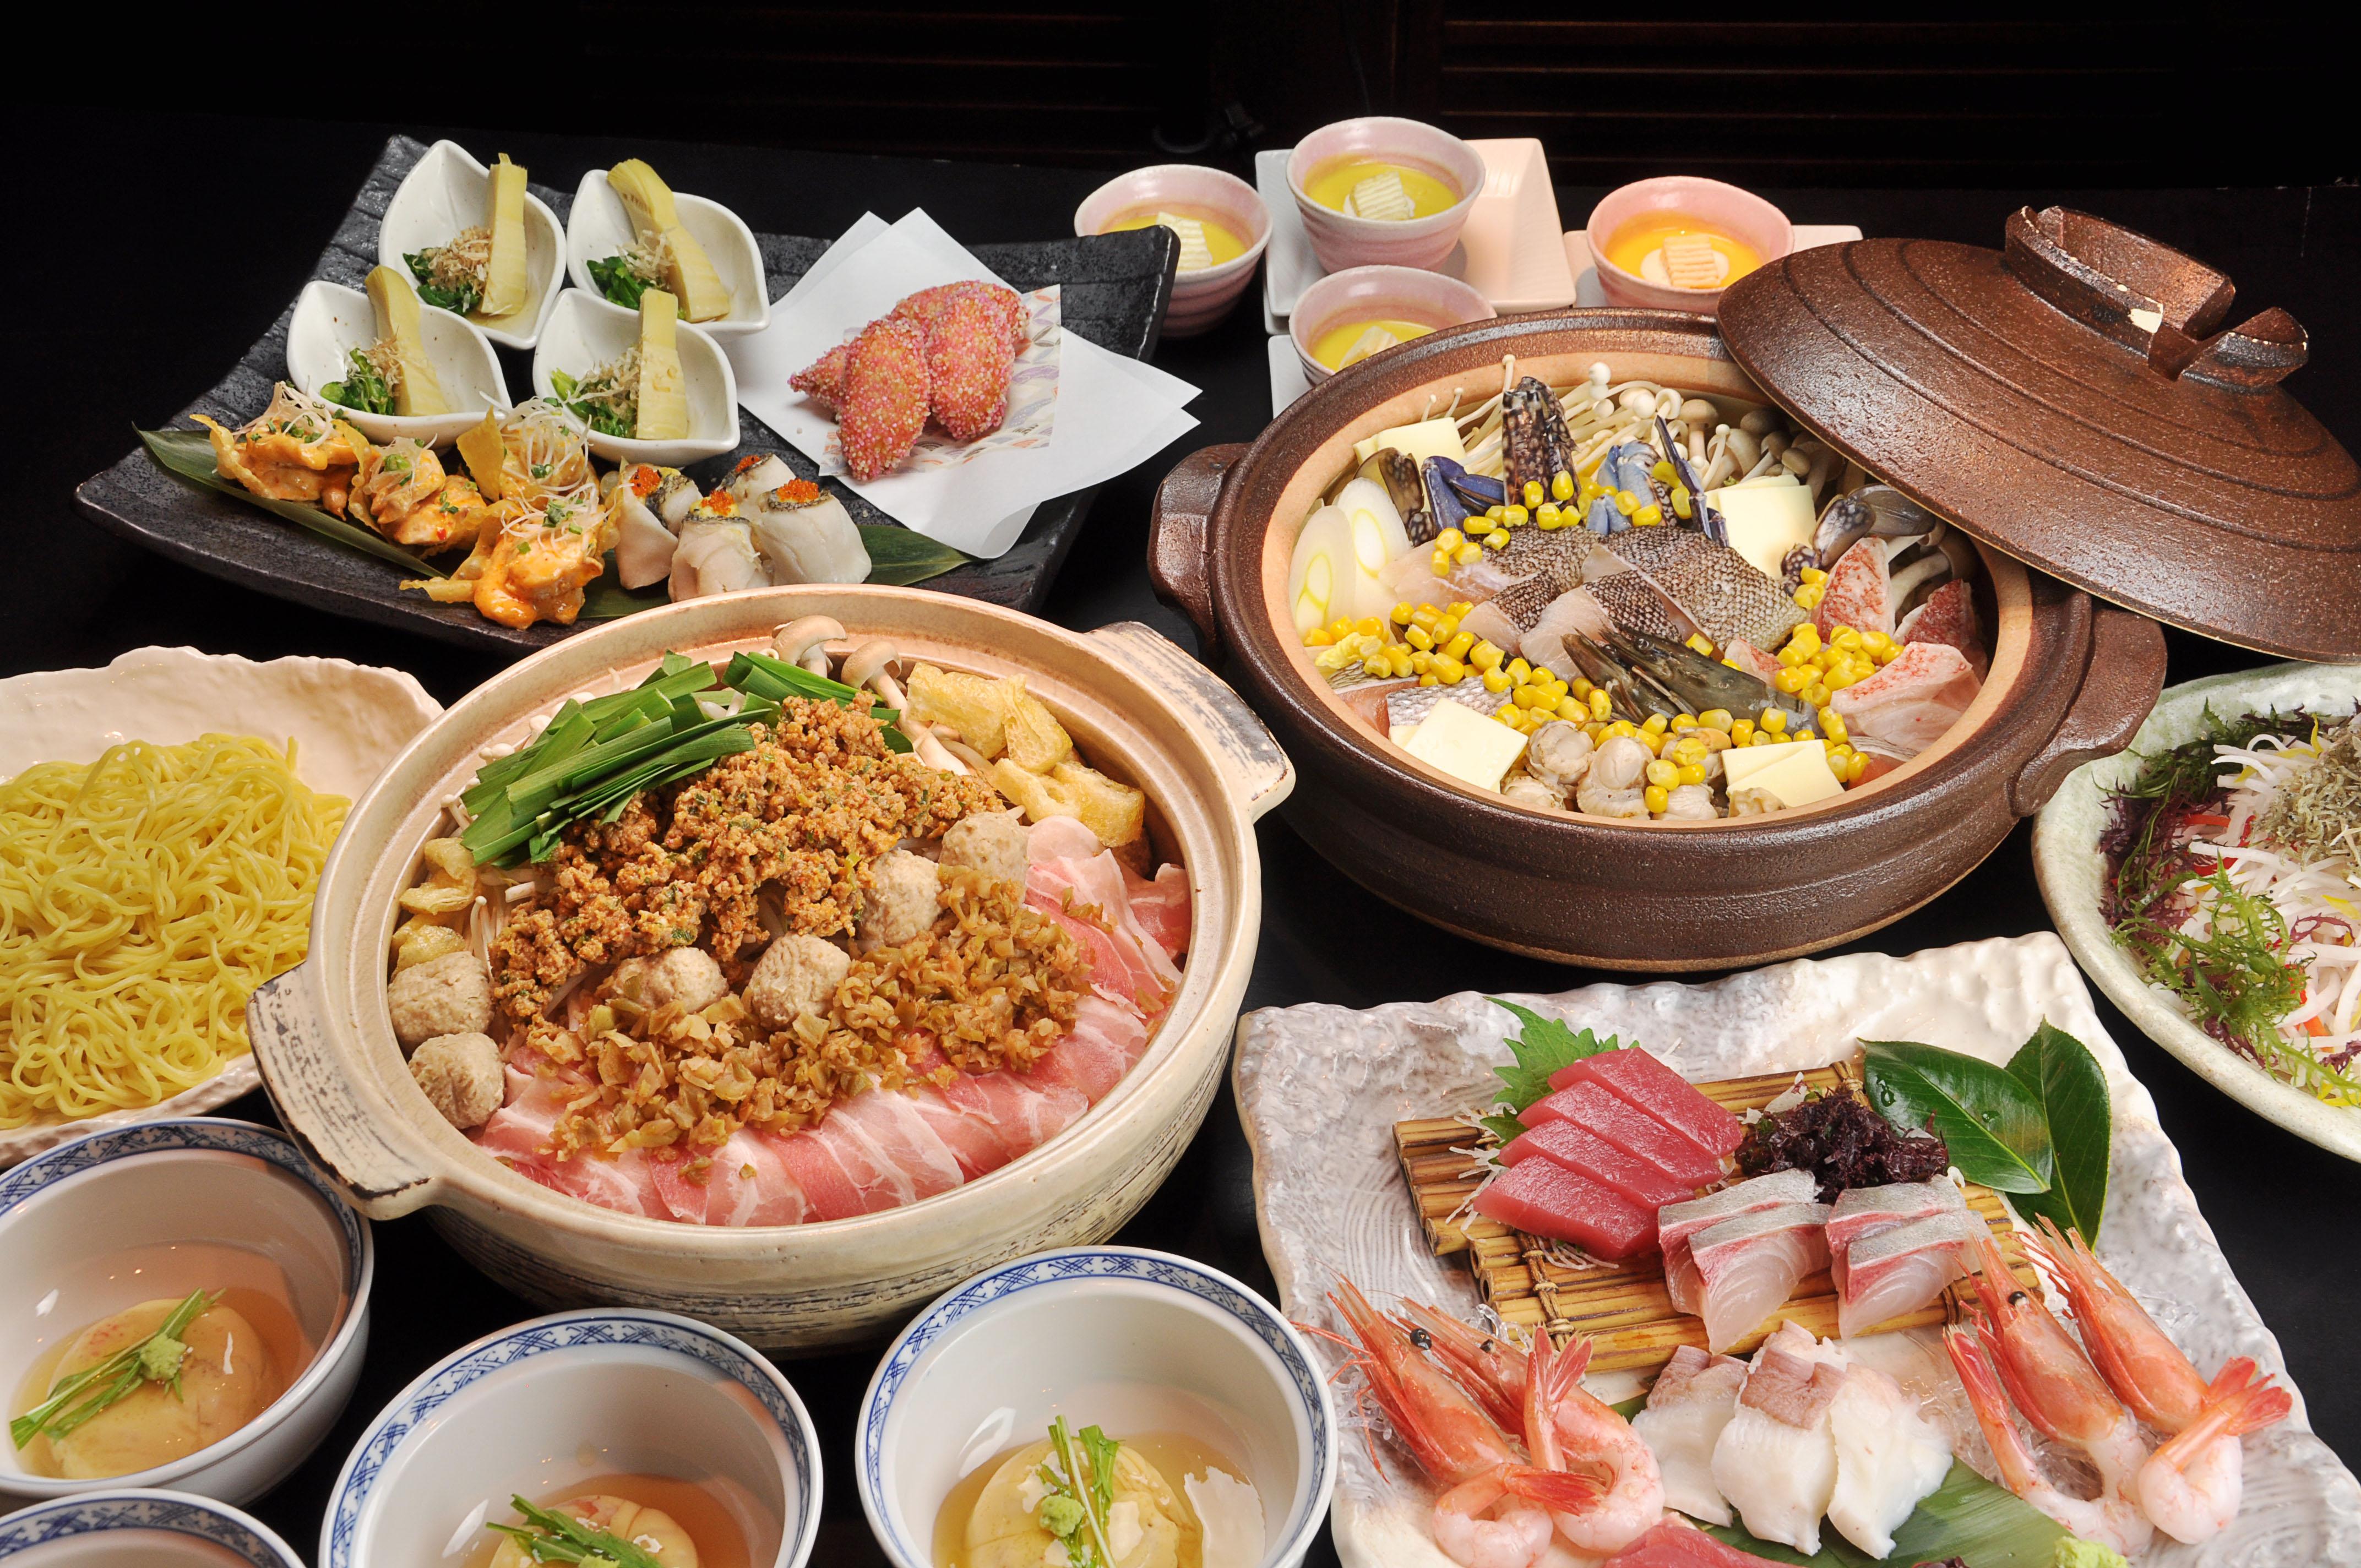 http://www.chikurinbou.com/news/topics/images/DSC_0158.JPG